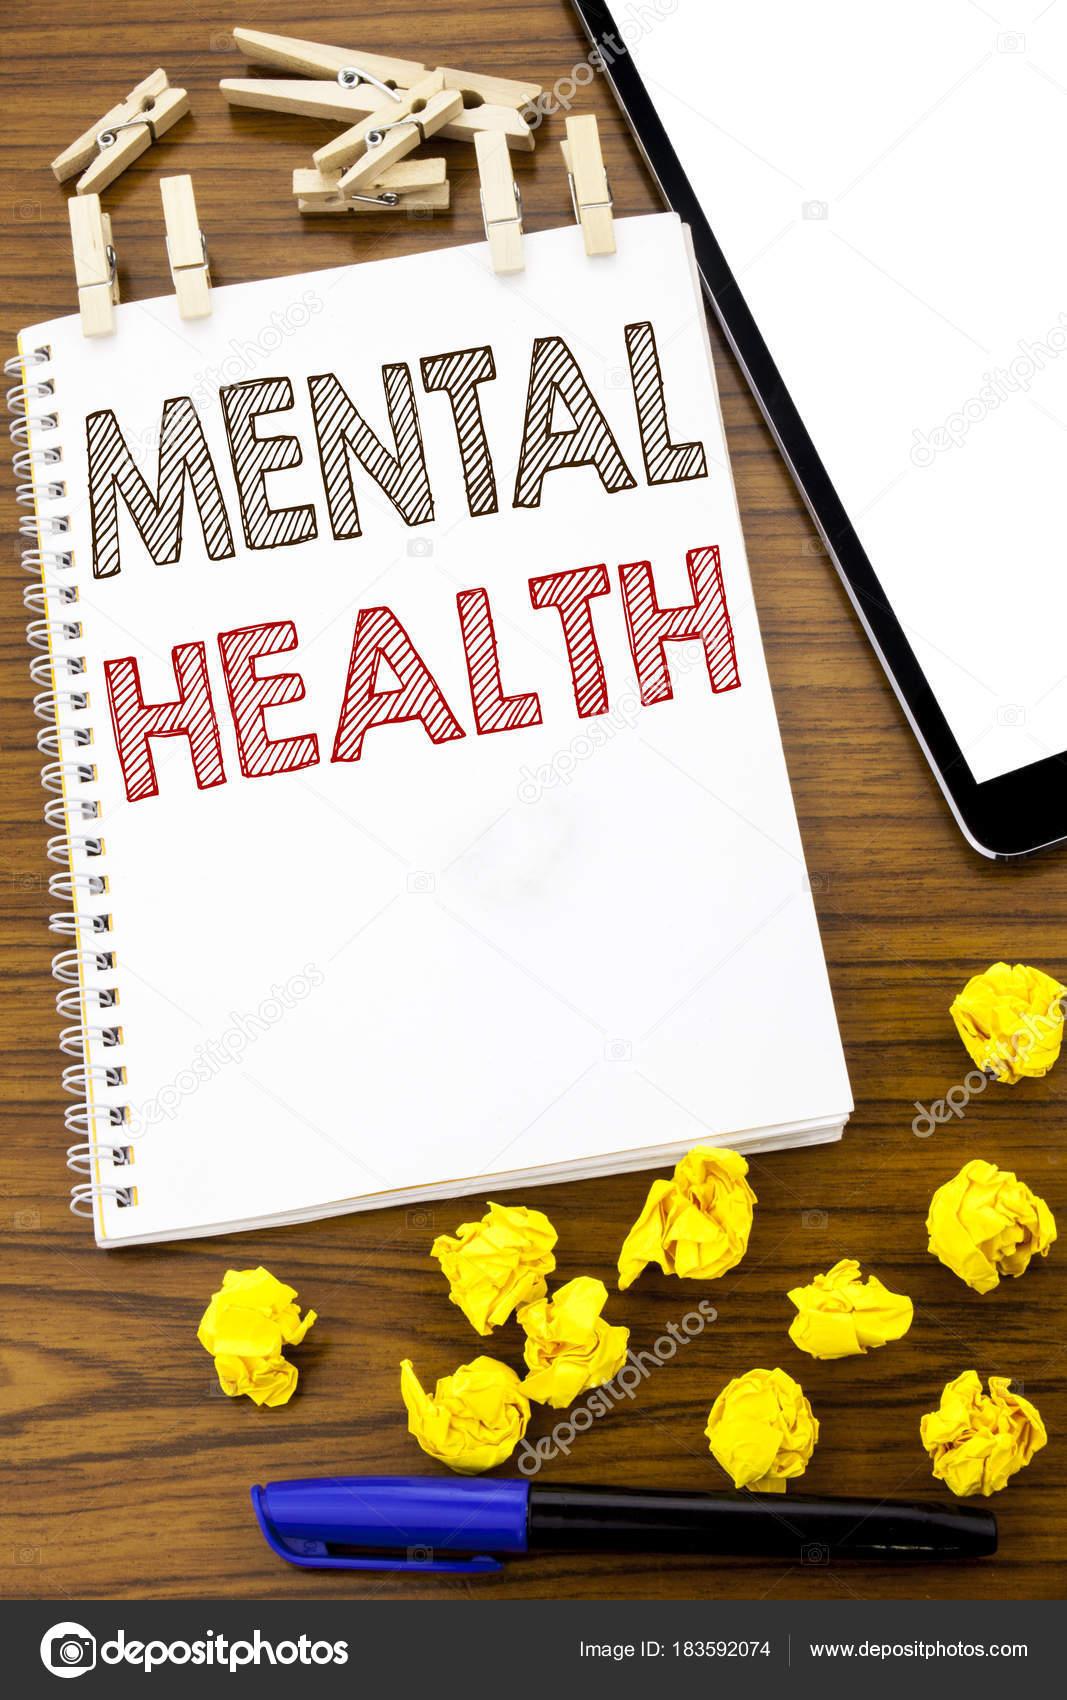 types of chronic mental illness